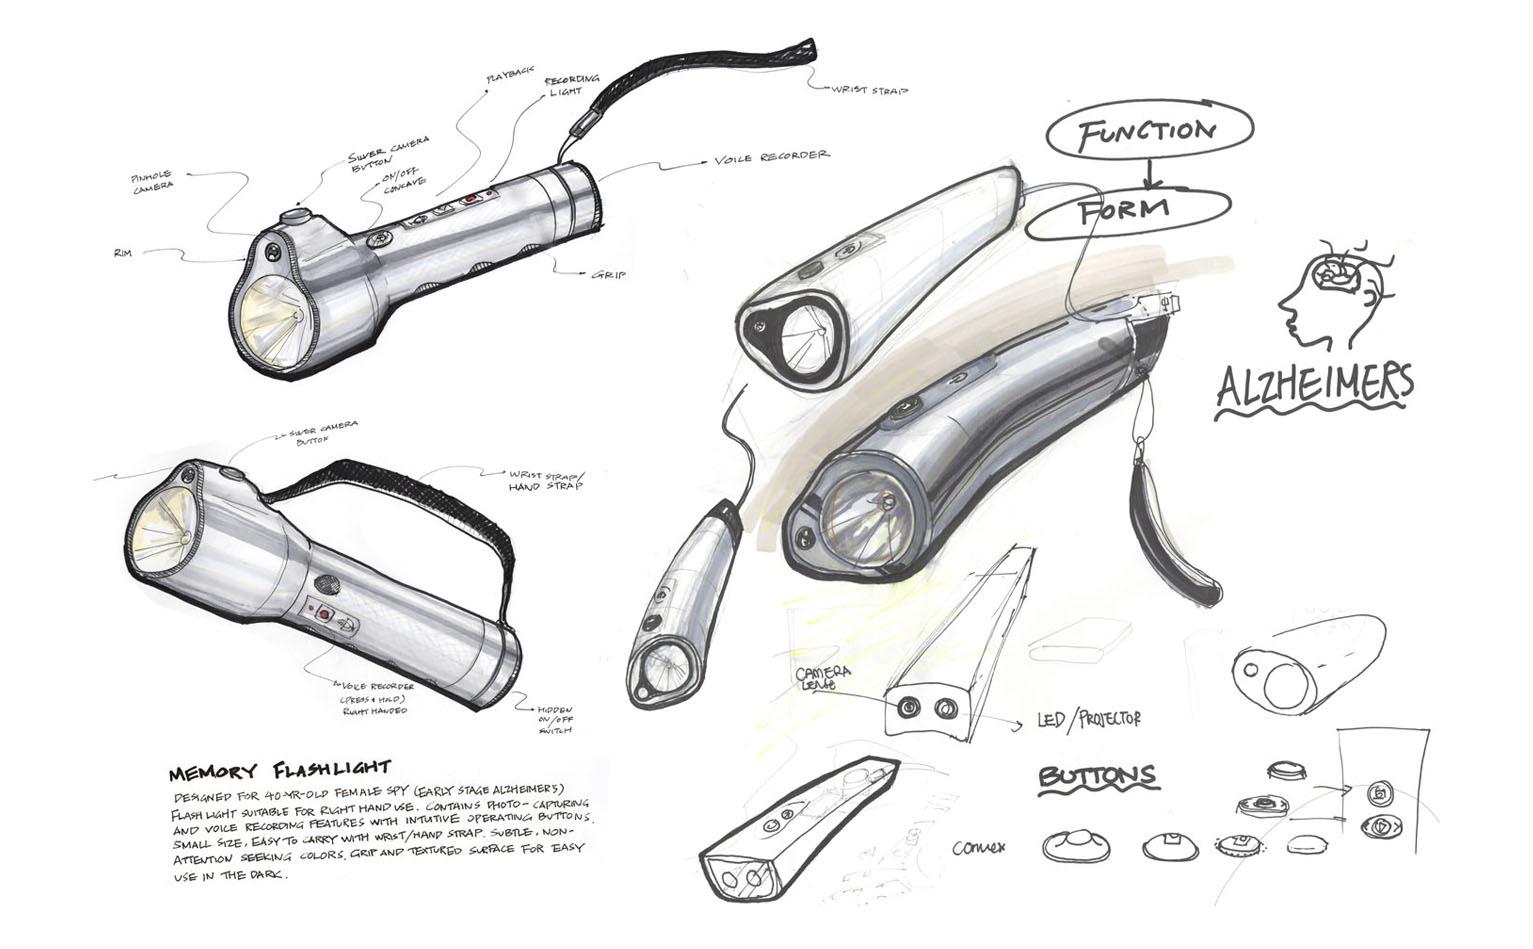 MEMO sketch.jpg